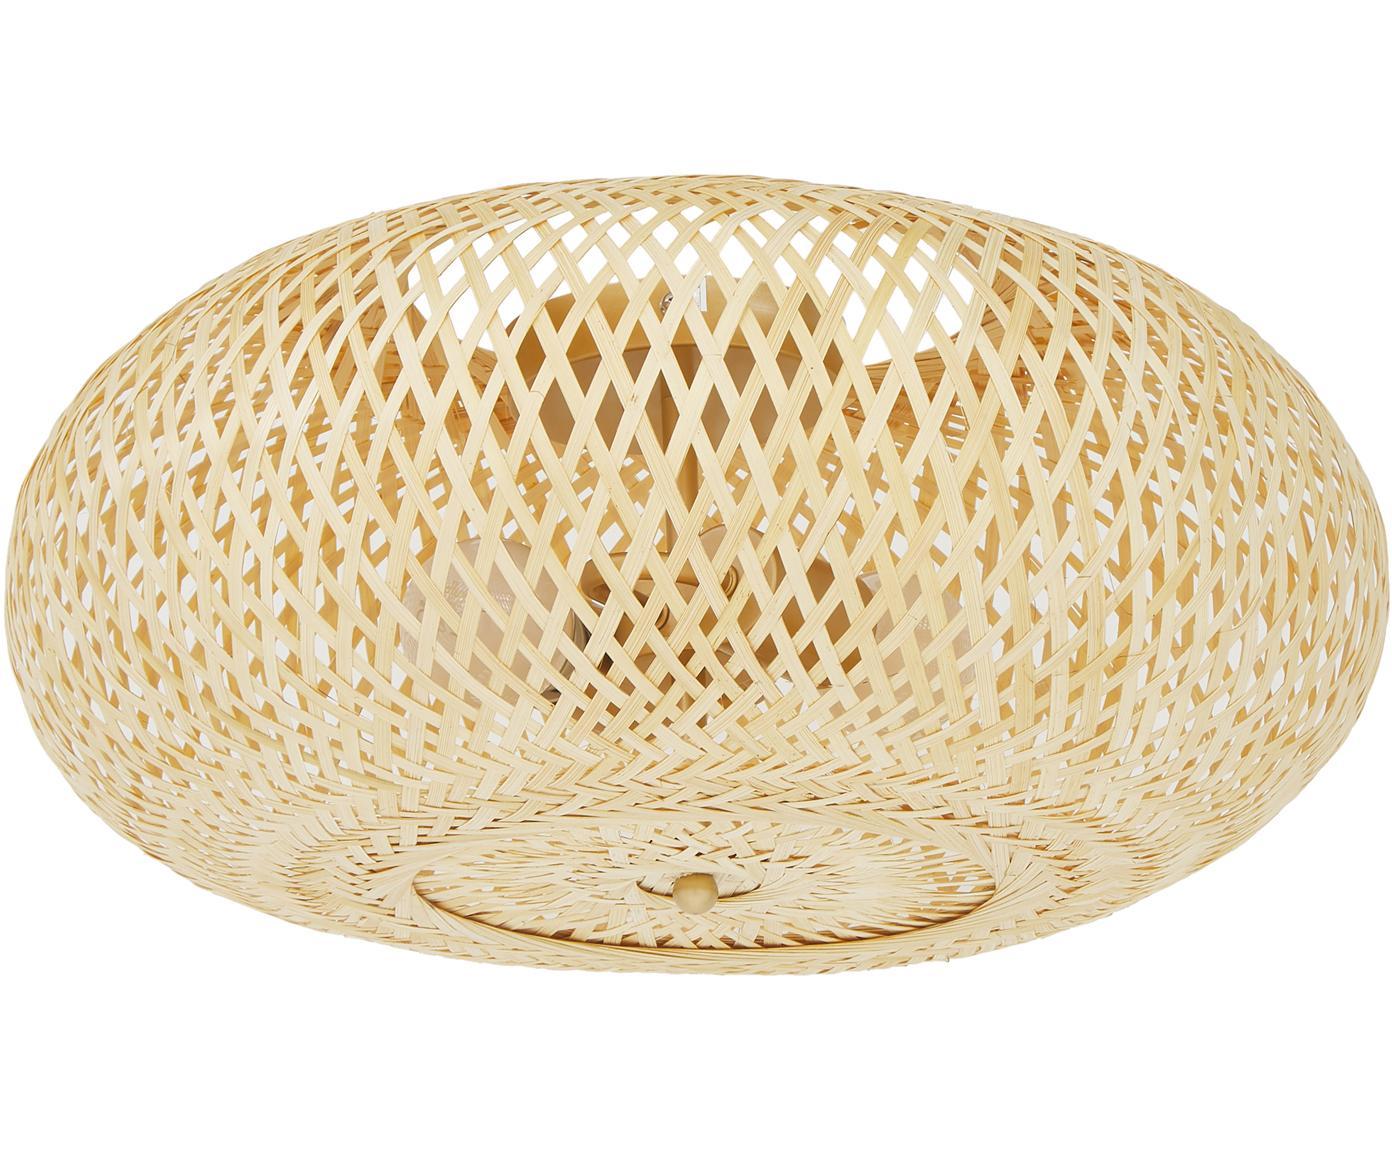 Plafondlamp Evelyn, Lampenkap: bamboe, Lampenkap: bamboekleurig. Baldakijn en bevestiging: mat beige, Ø 50 x H 20 cm